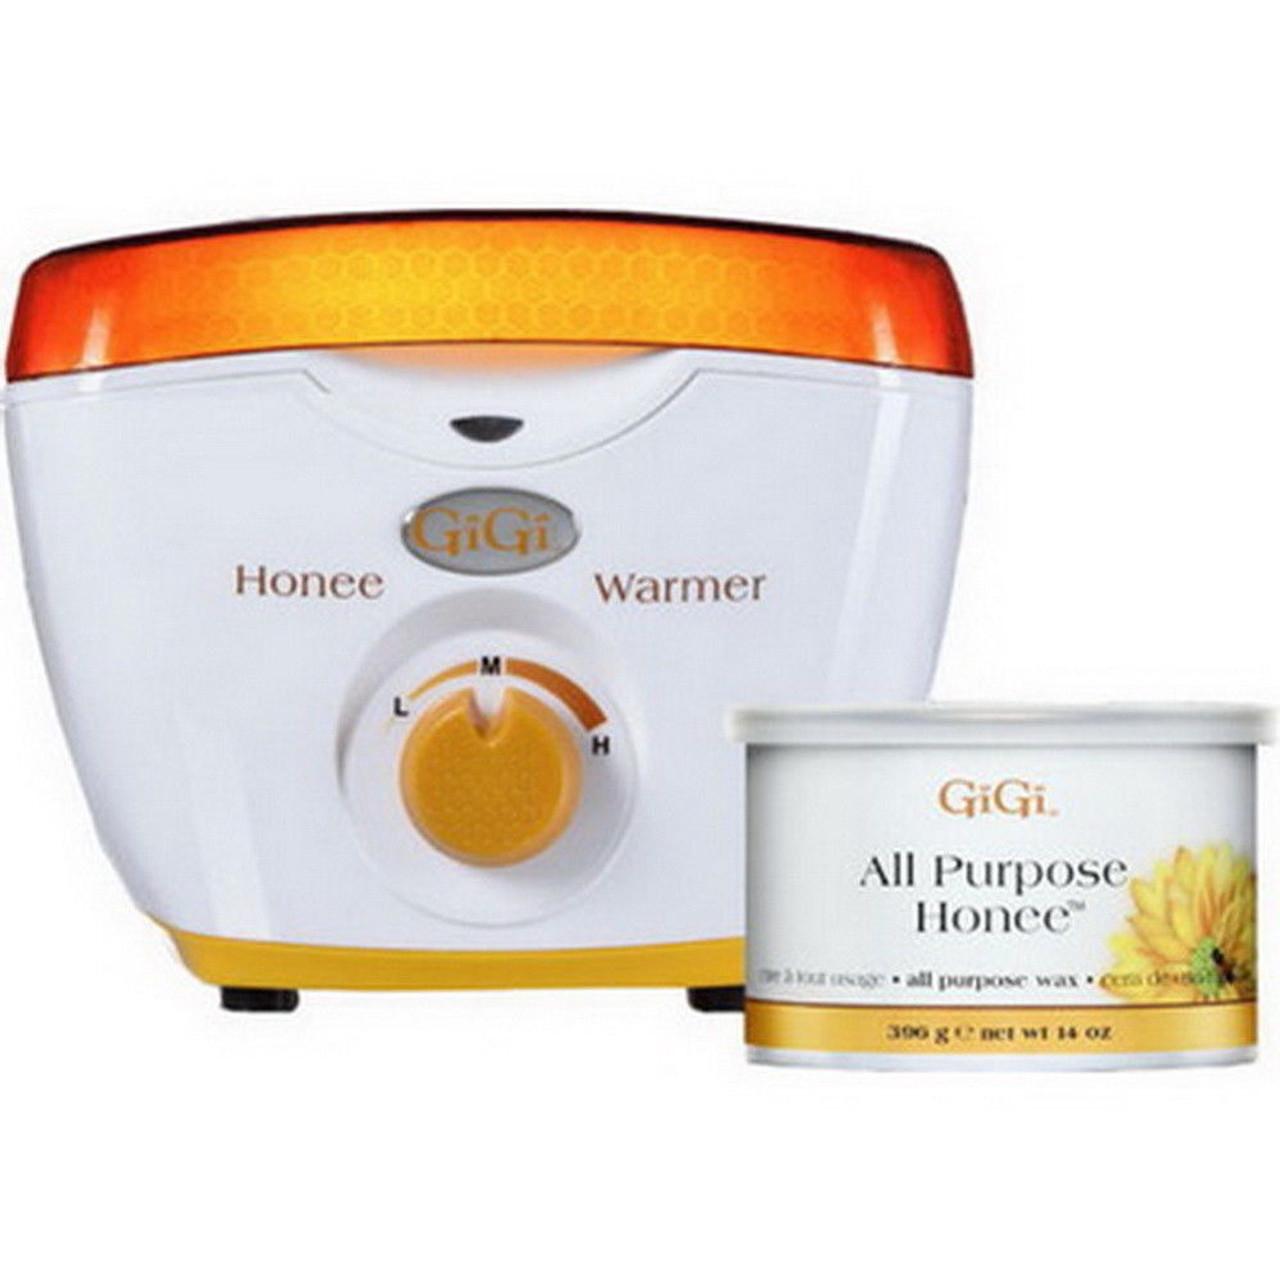 GiGi Honee Warmer 14 oz